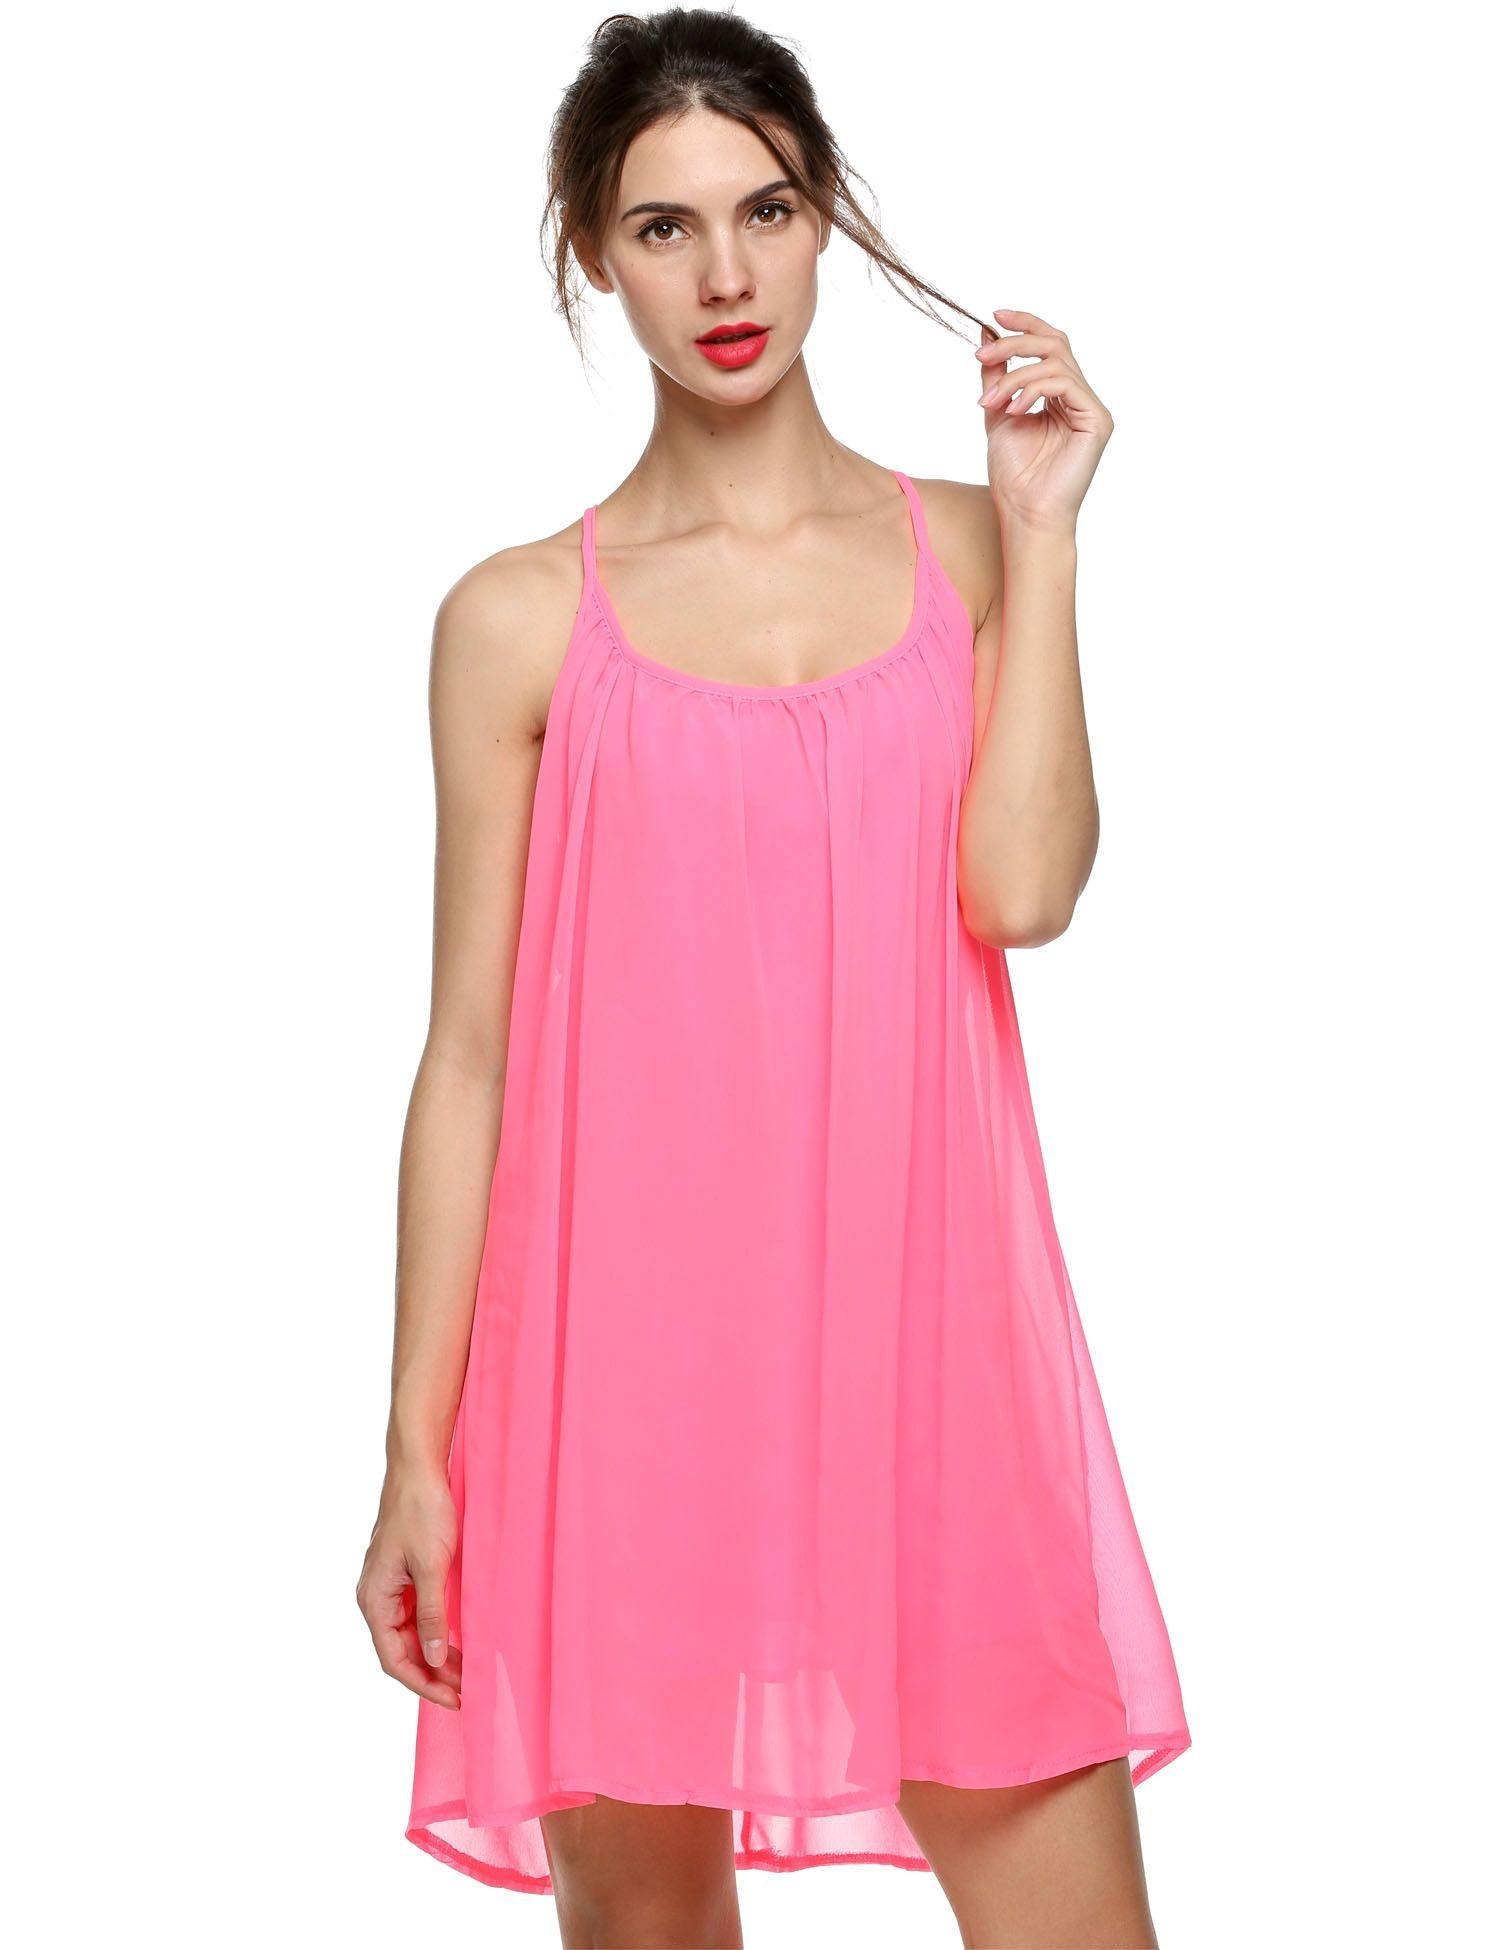 8059c167ec92 Loose Chiffon Round Neck Sleeveless Back Hollow Solid Casual Dress ...